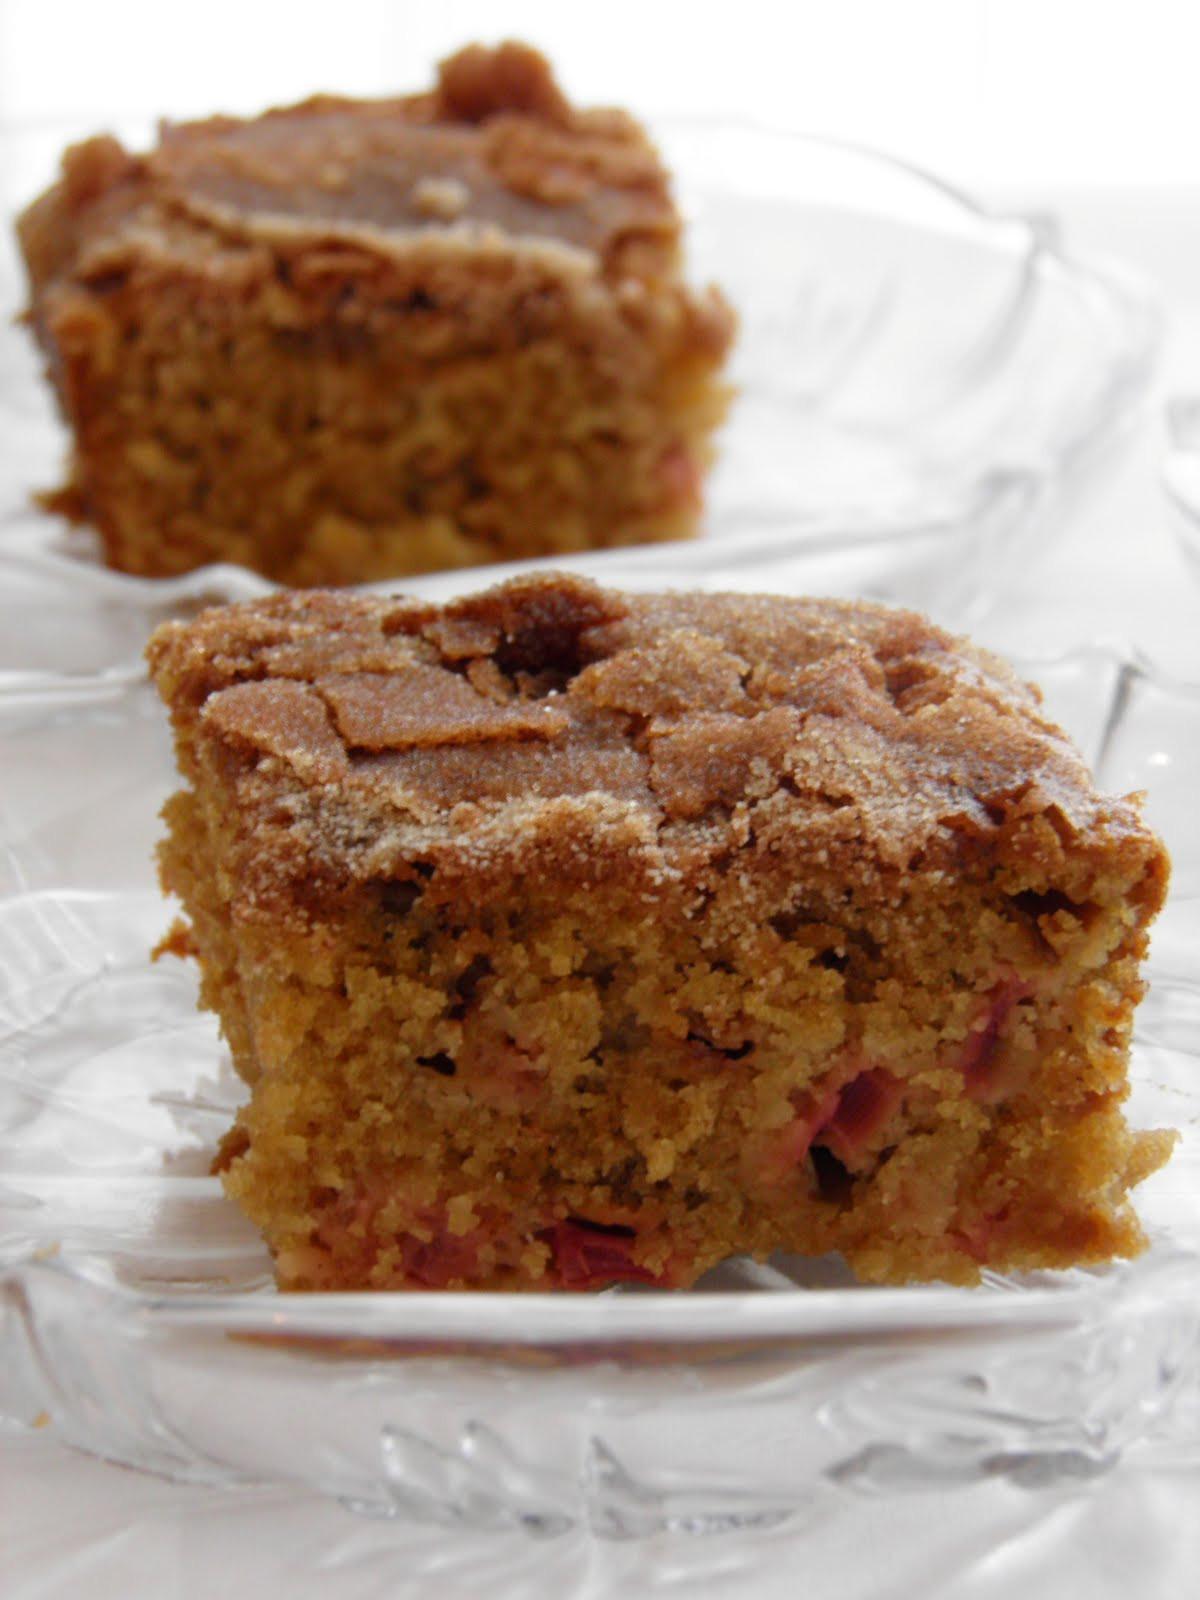 Rhubarb Cake Recipe  Baking and Mistaking Guest Post Rhubarb Cake